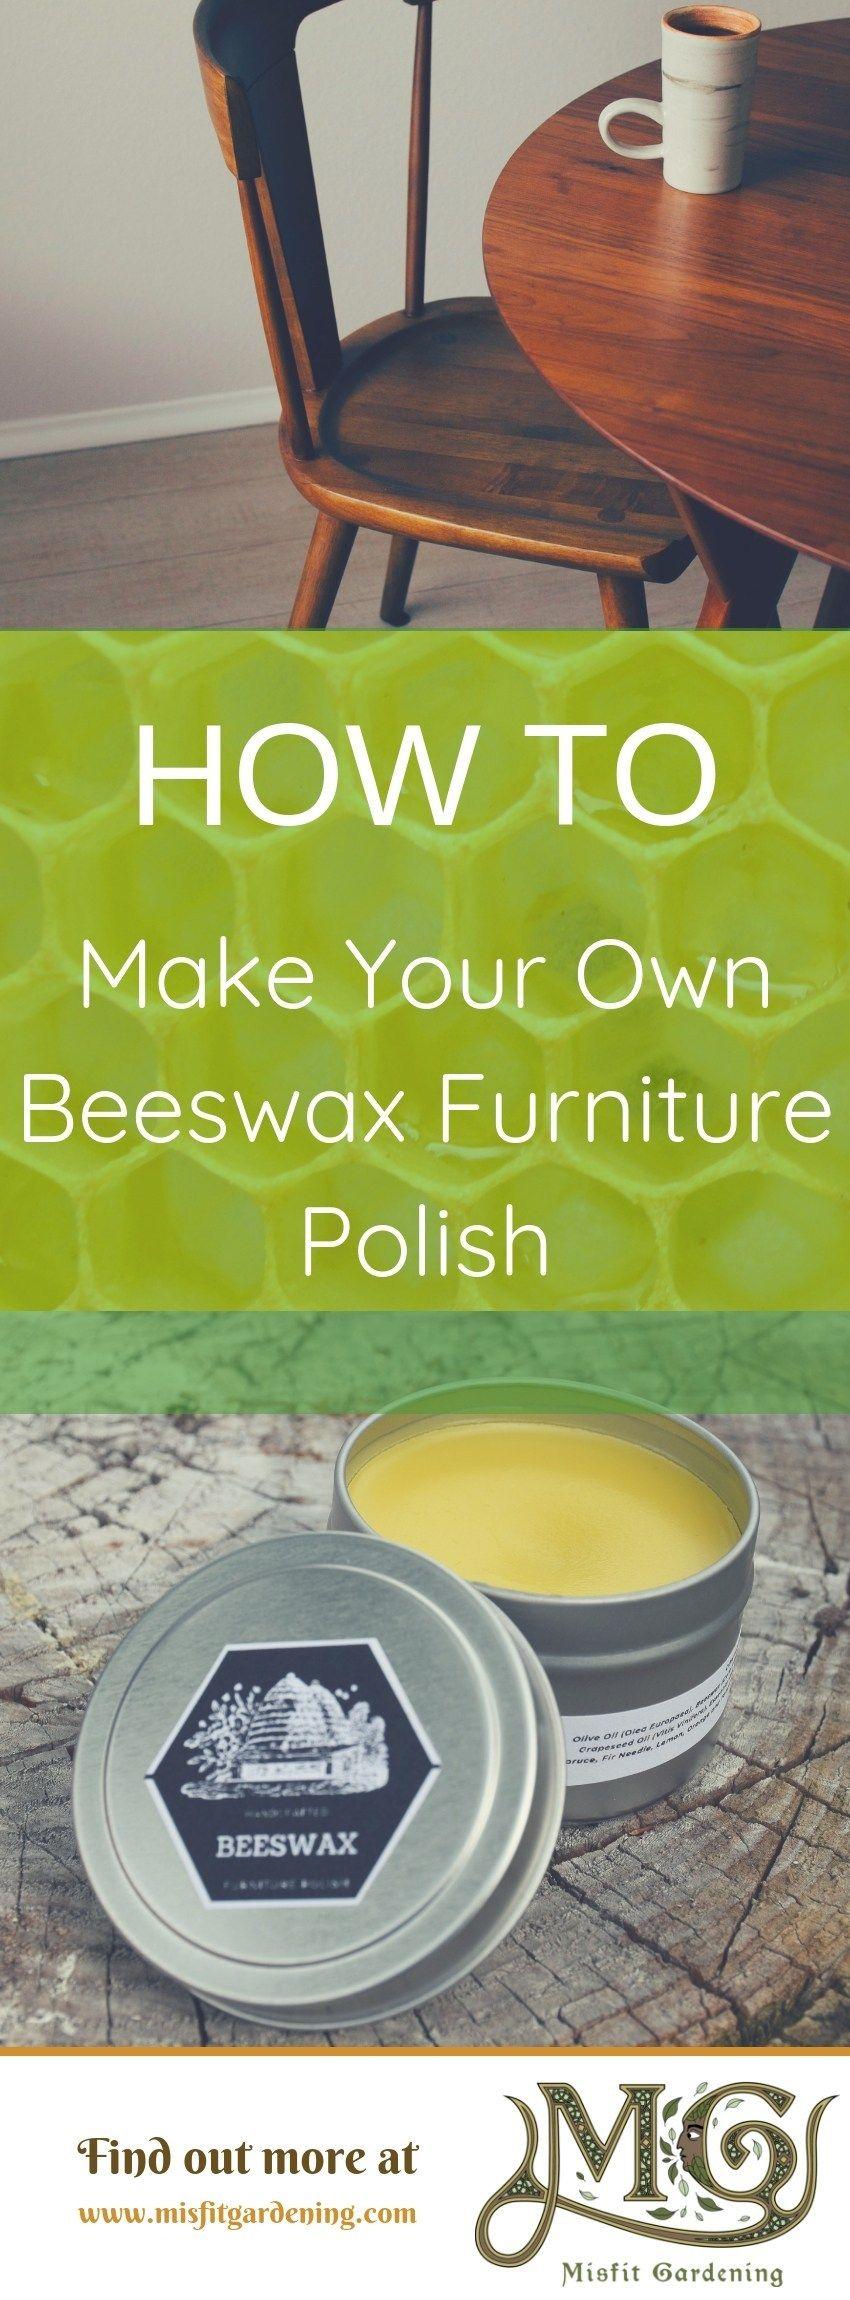 How To Make DIY Beeswax Furniture Polish   Beeswax ...